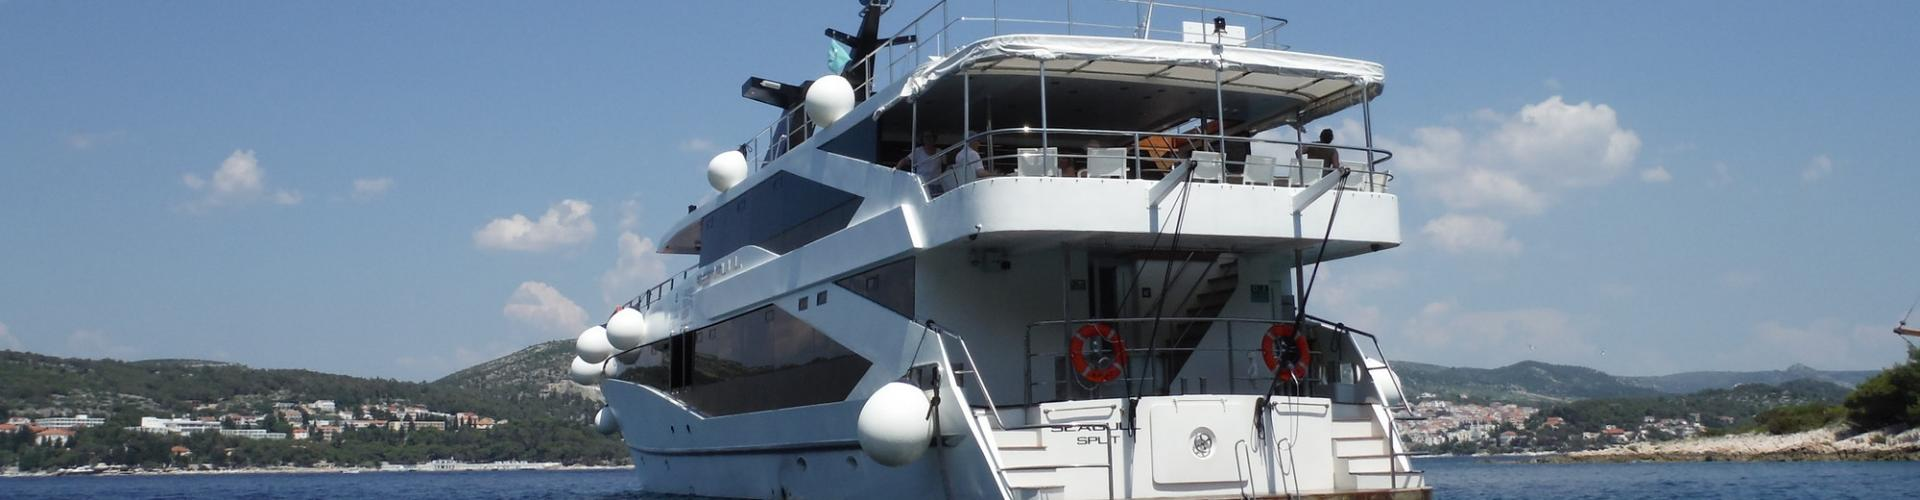 1983. Premium Superior cruiser MV Seagull